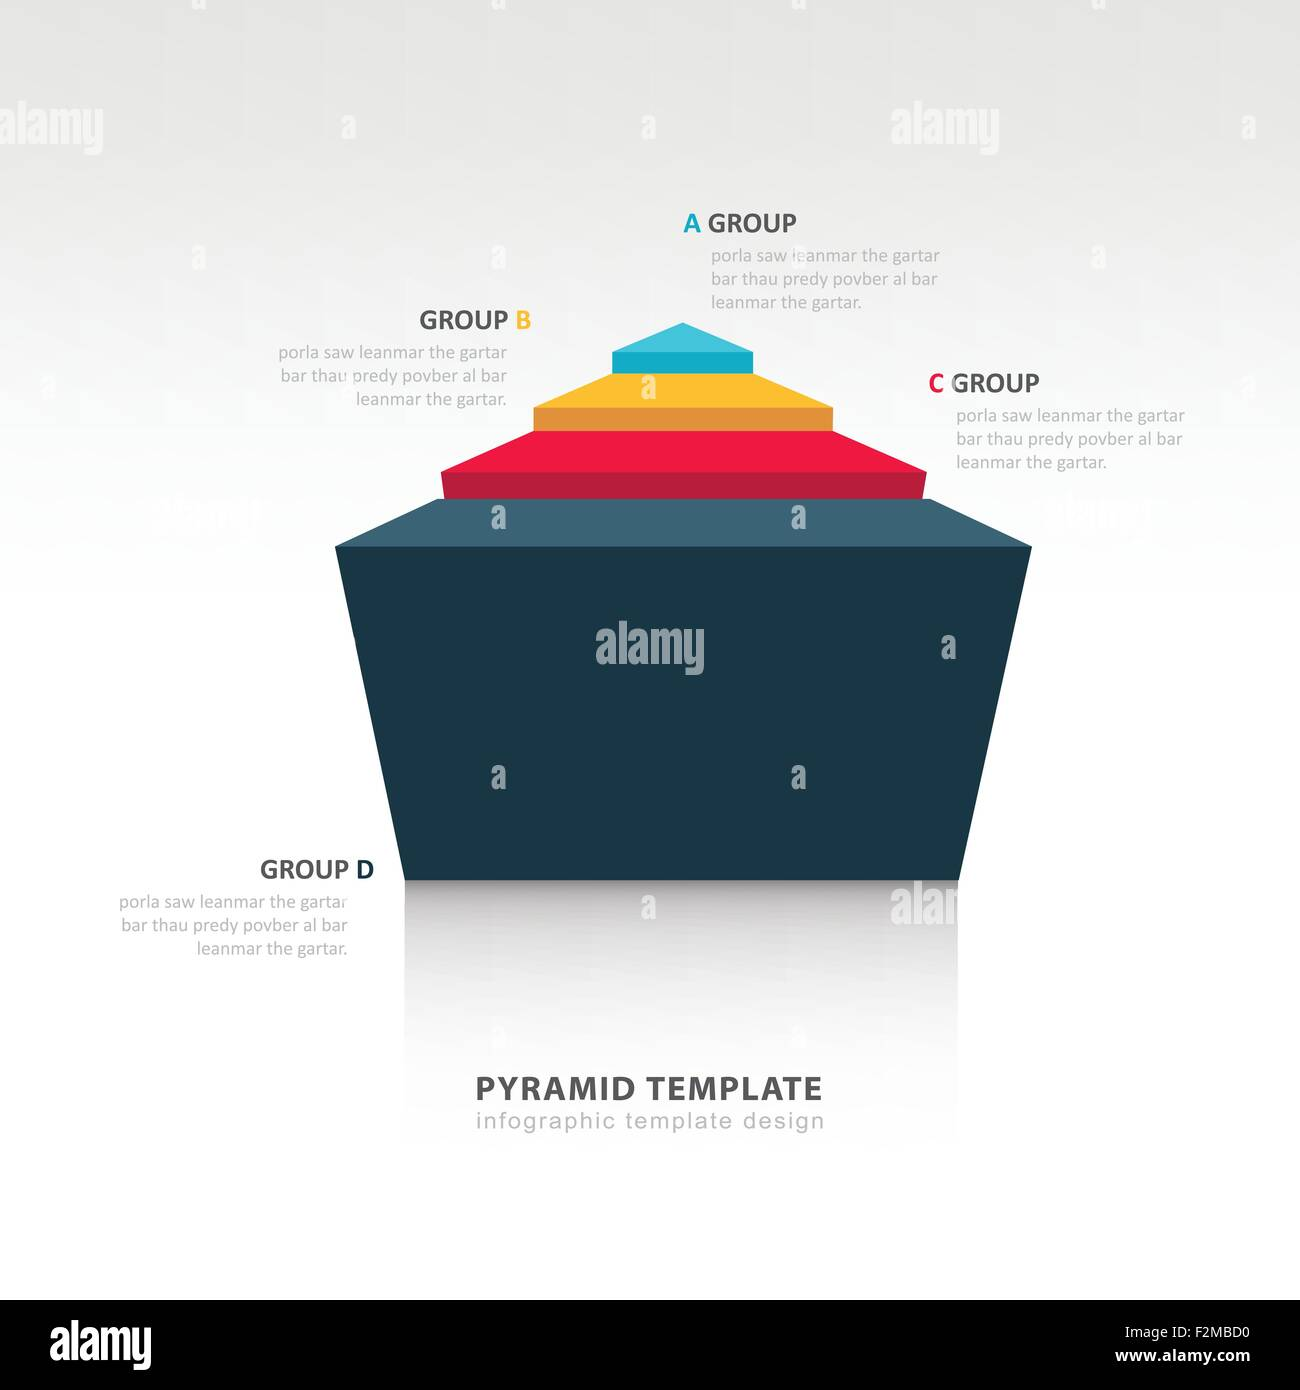 pyramid infographic template stock photos pyramid infographic